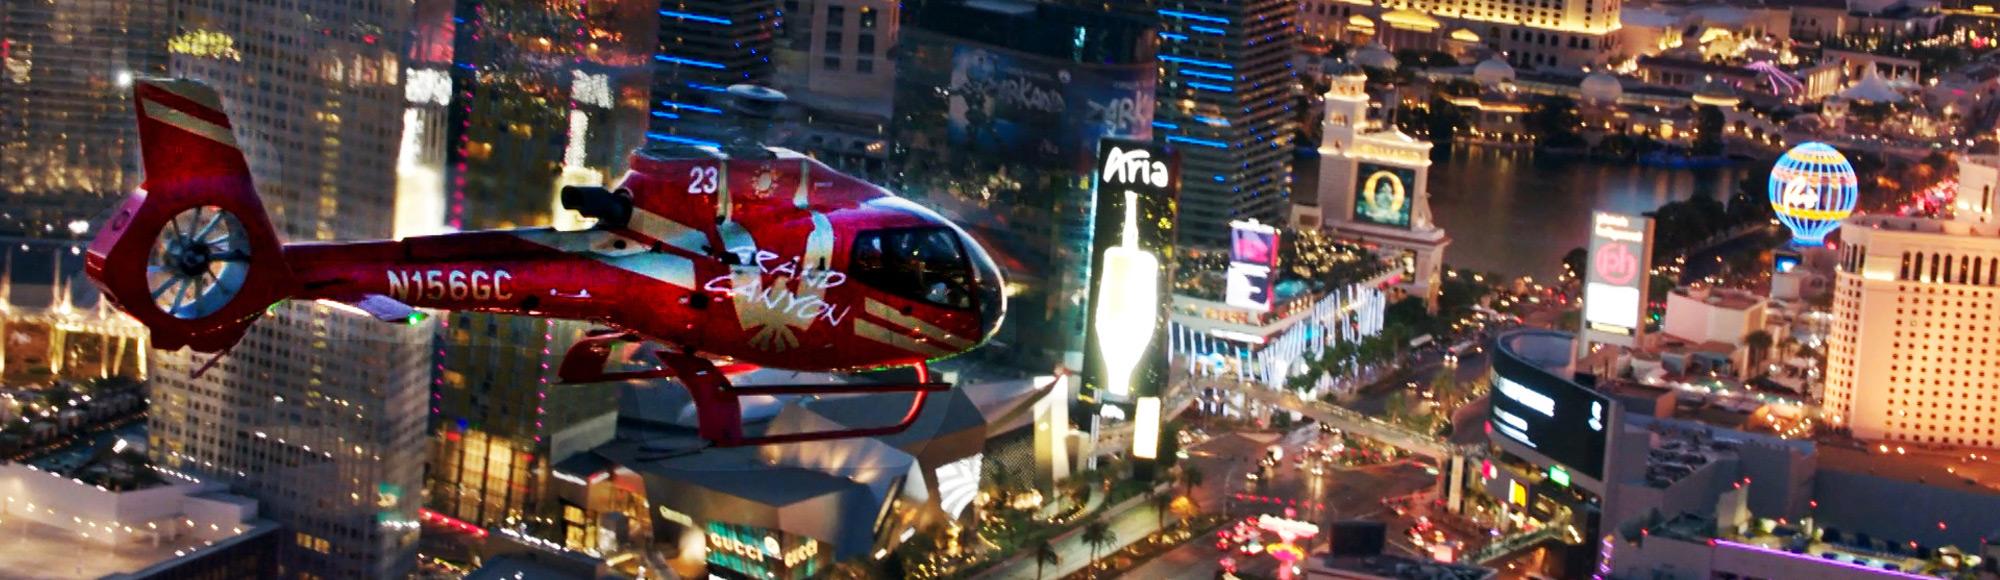 Las Vegas Strip Highlights tour